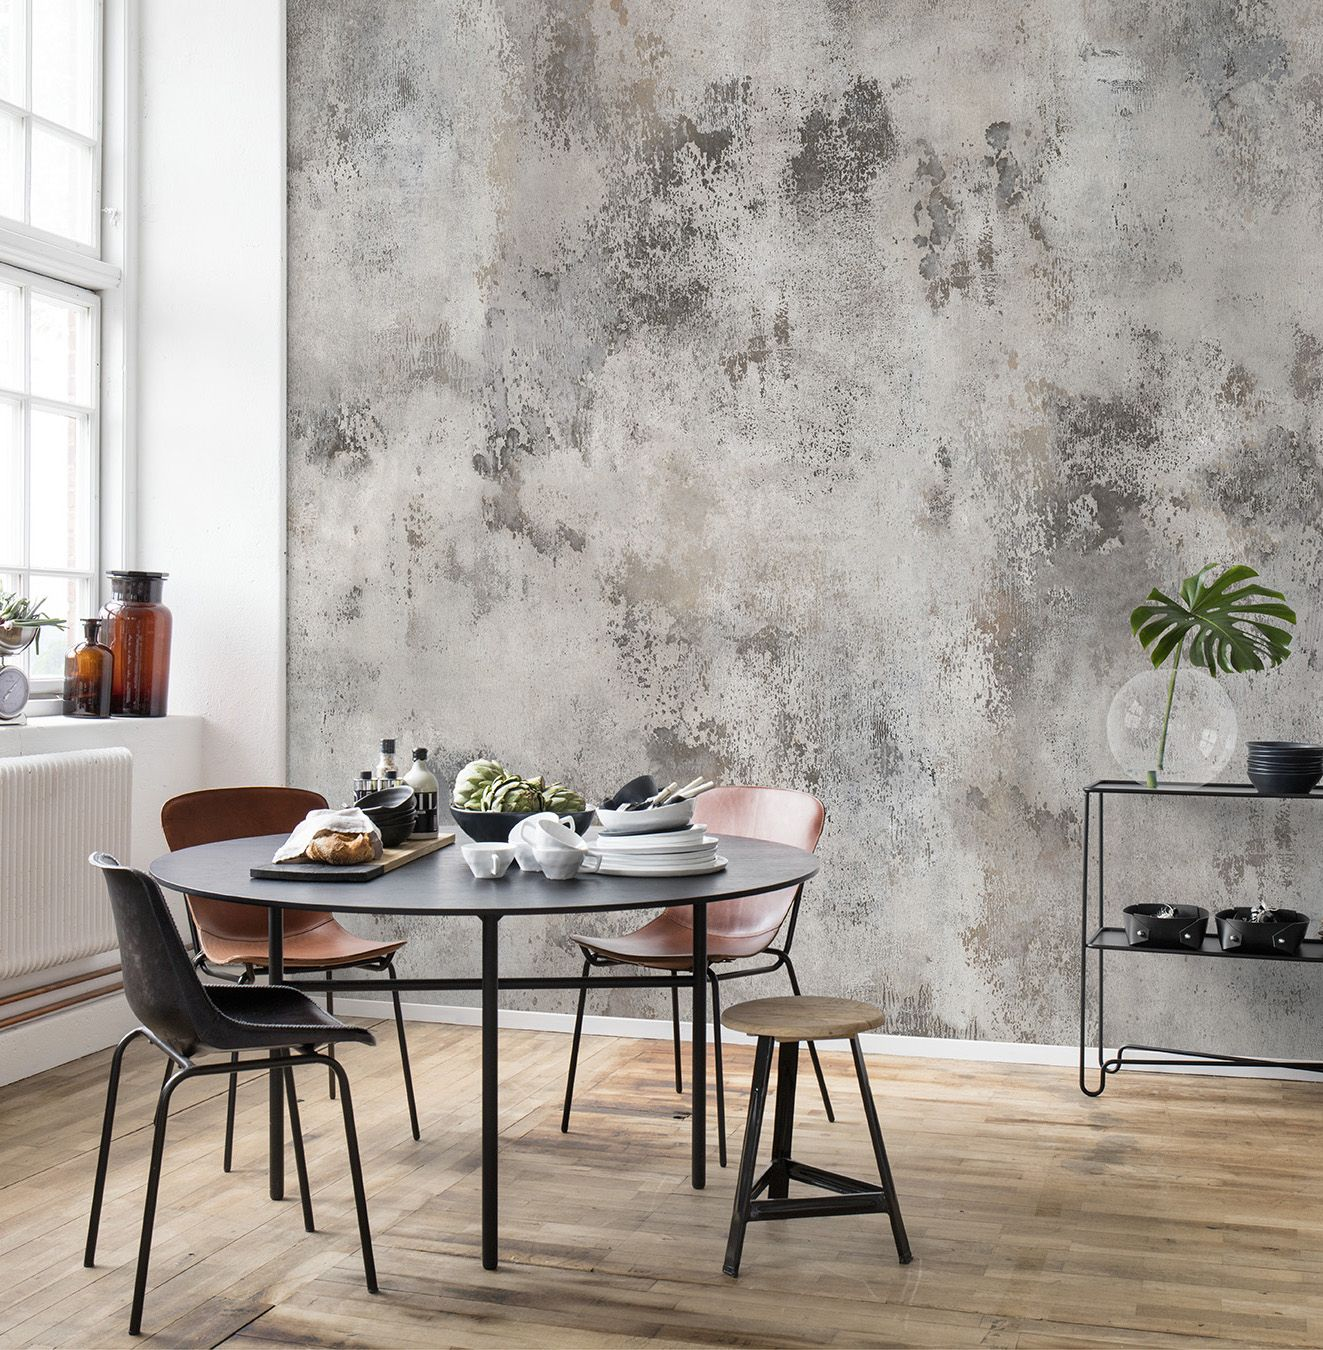 Wohnzimmer des modernen interieurs des hauses patina  living  pinterest  haus studio design and interiors